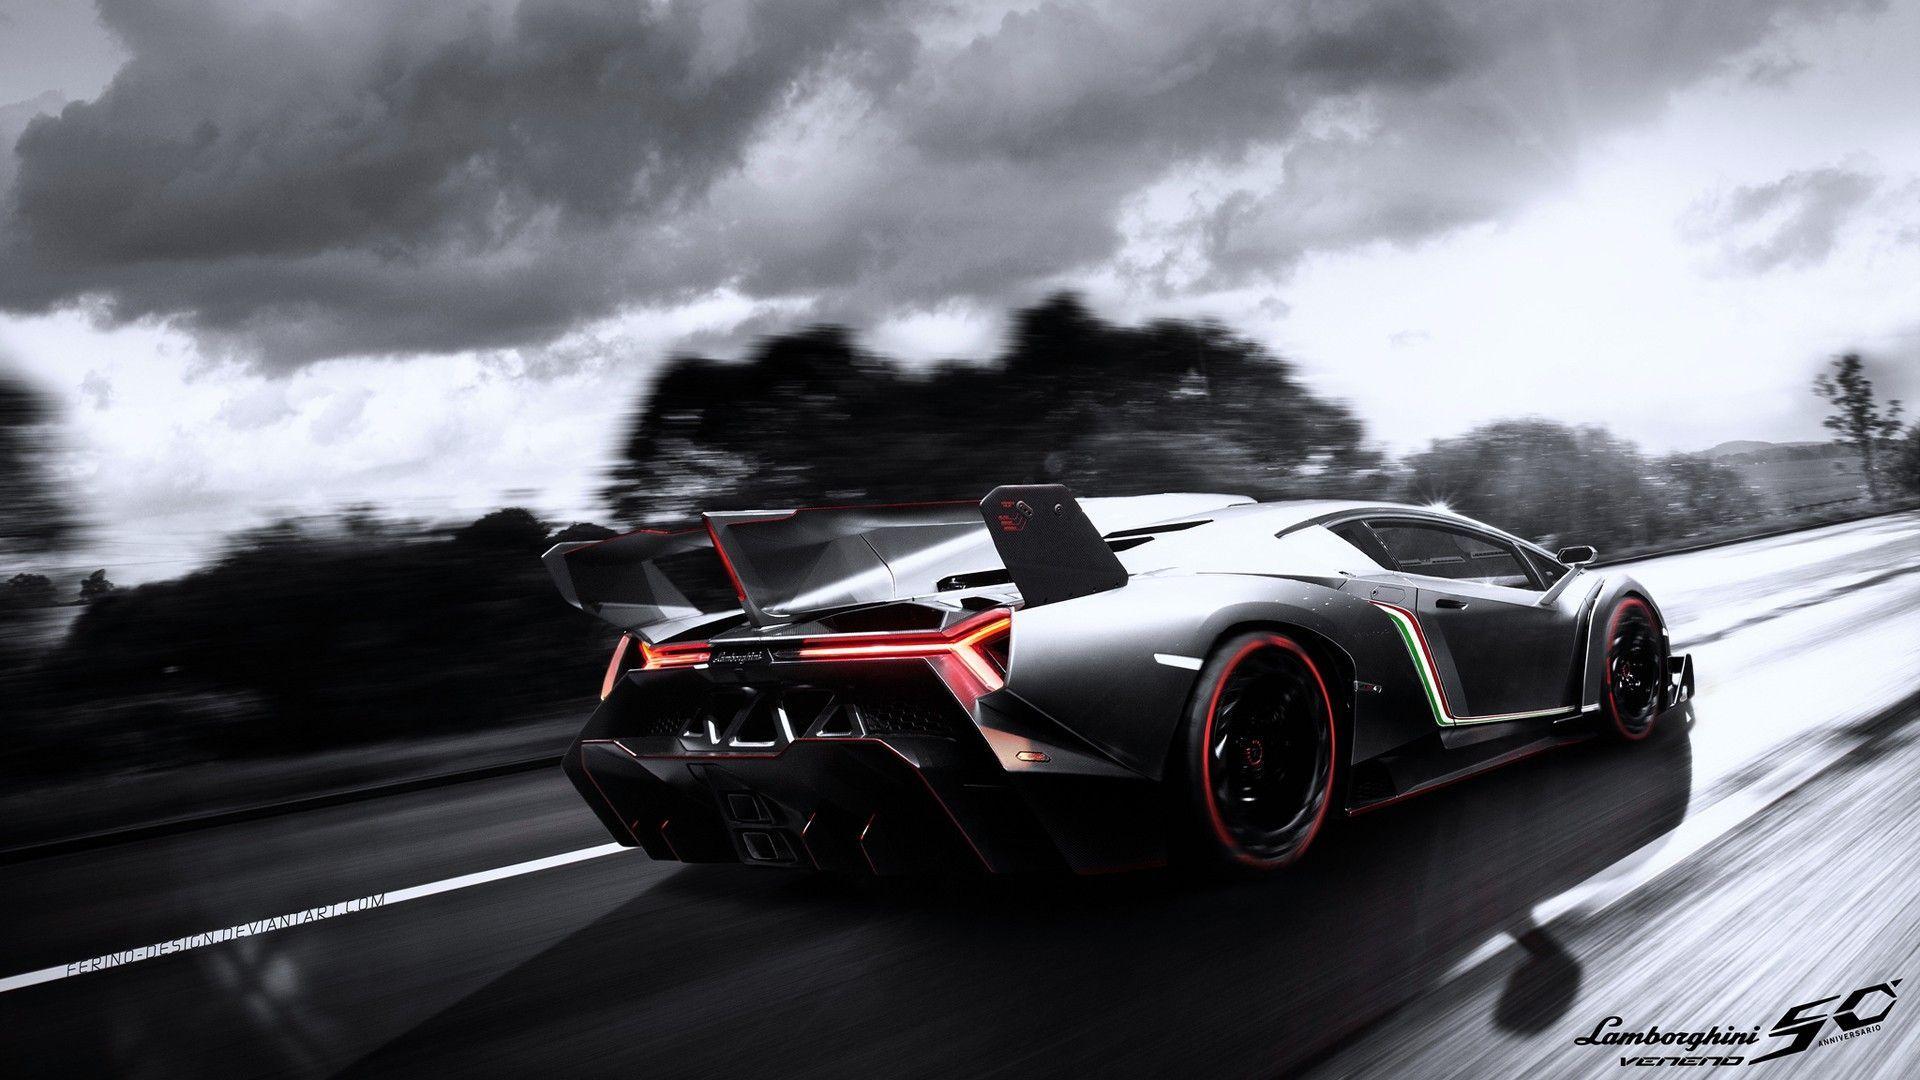 Lamborghini Veneno Wallpaper (53 Wallpapers)